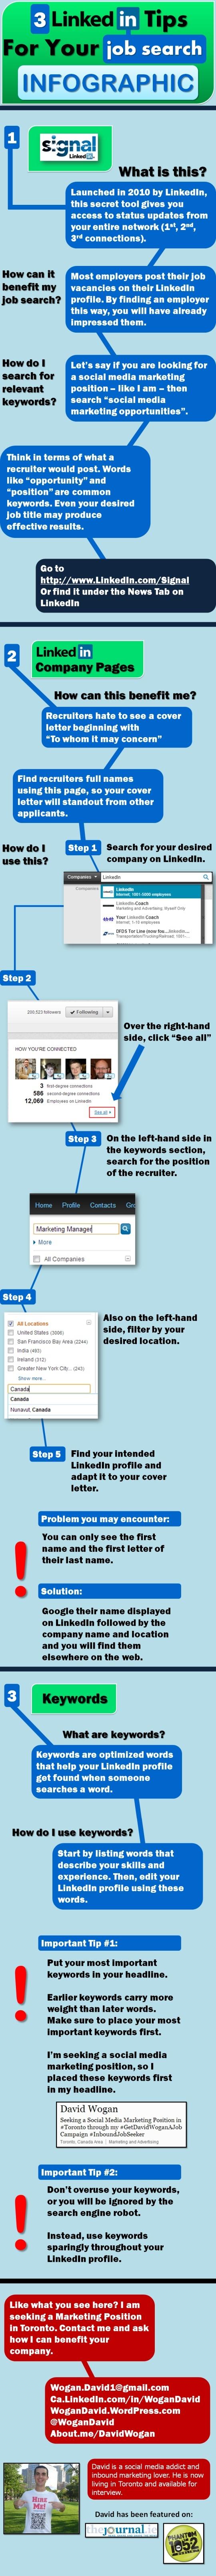 3 consejos para usar Linkedin para buscar trabajo